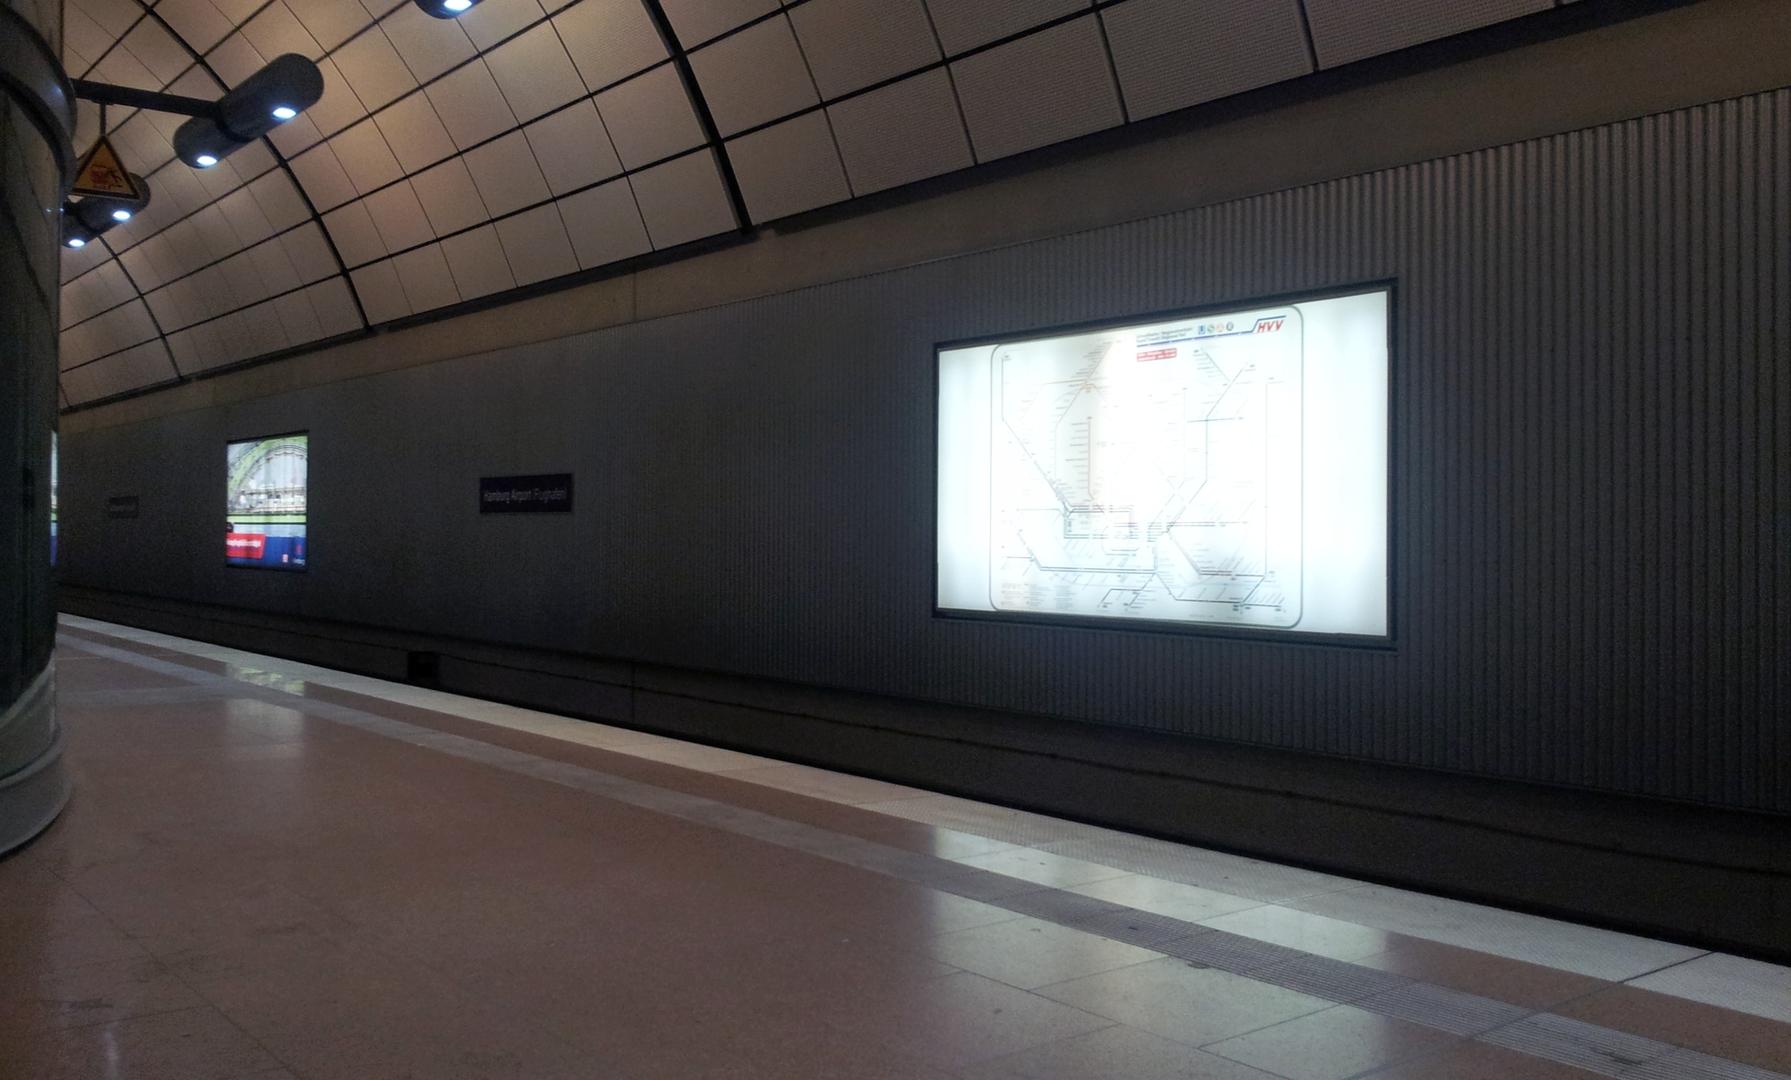 S-Bahn Airport